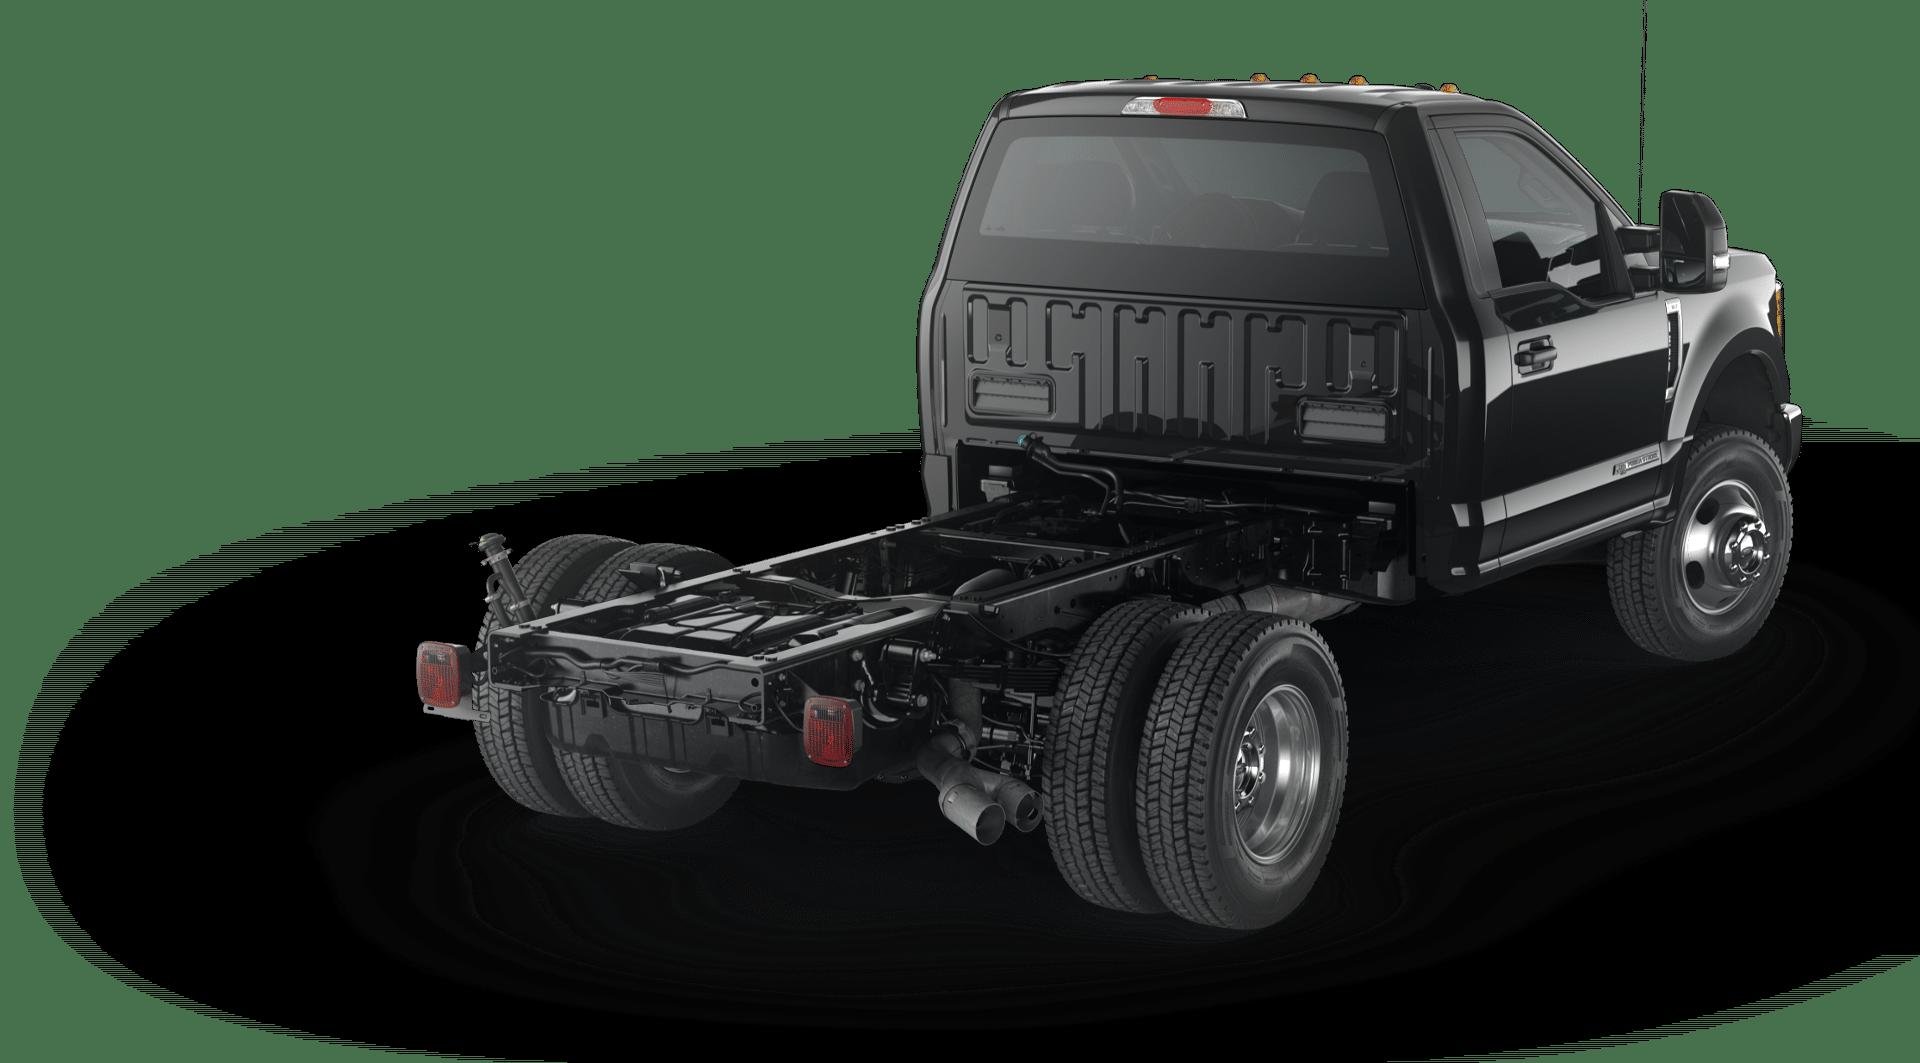 2019 F-350 Regular Cab DRW 4x4,  Cab Chassis #N8346 - photo 3